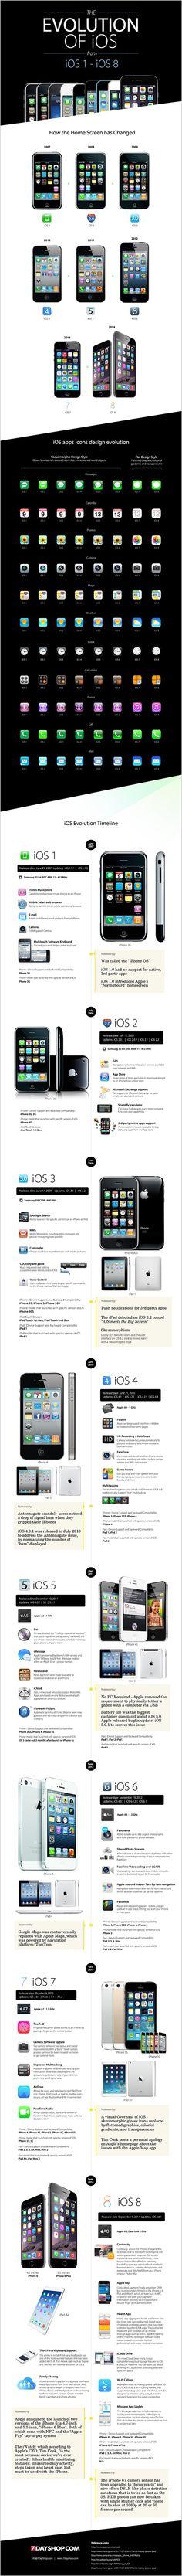 iOS : ชม Infographic การพัฒนาของ iOS ตั้งแต่ iOS 1- iOS 8 เปลี่ยนแปลงไปแค่ไหน มาดูกัน !!